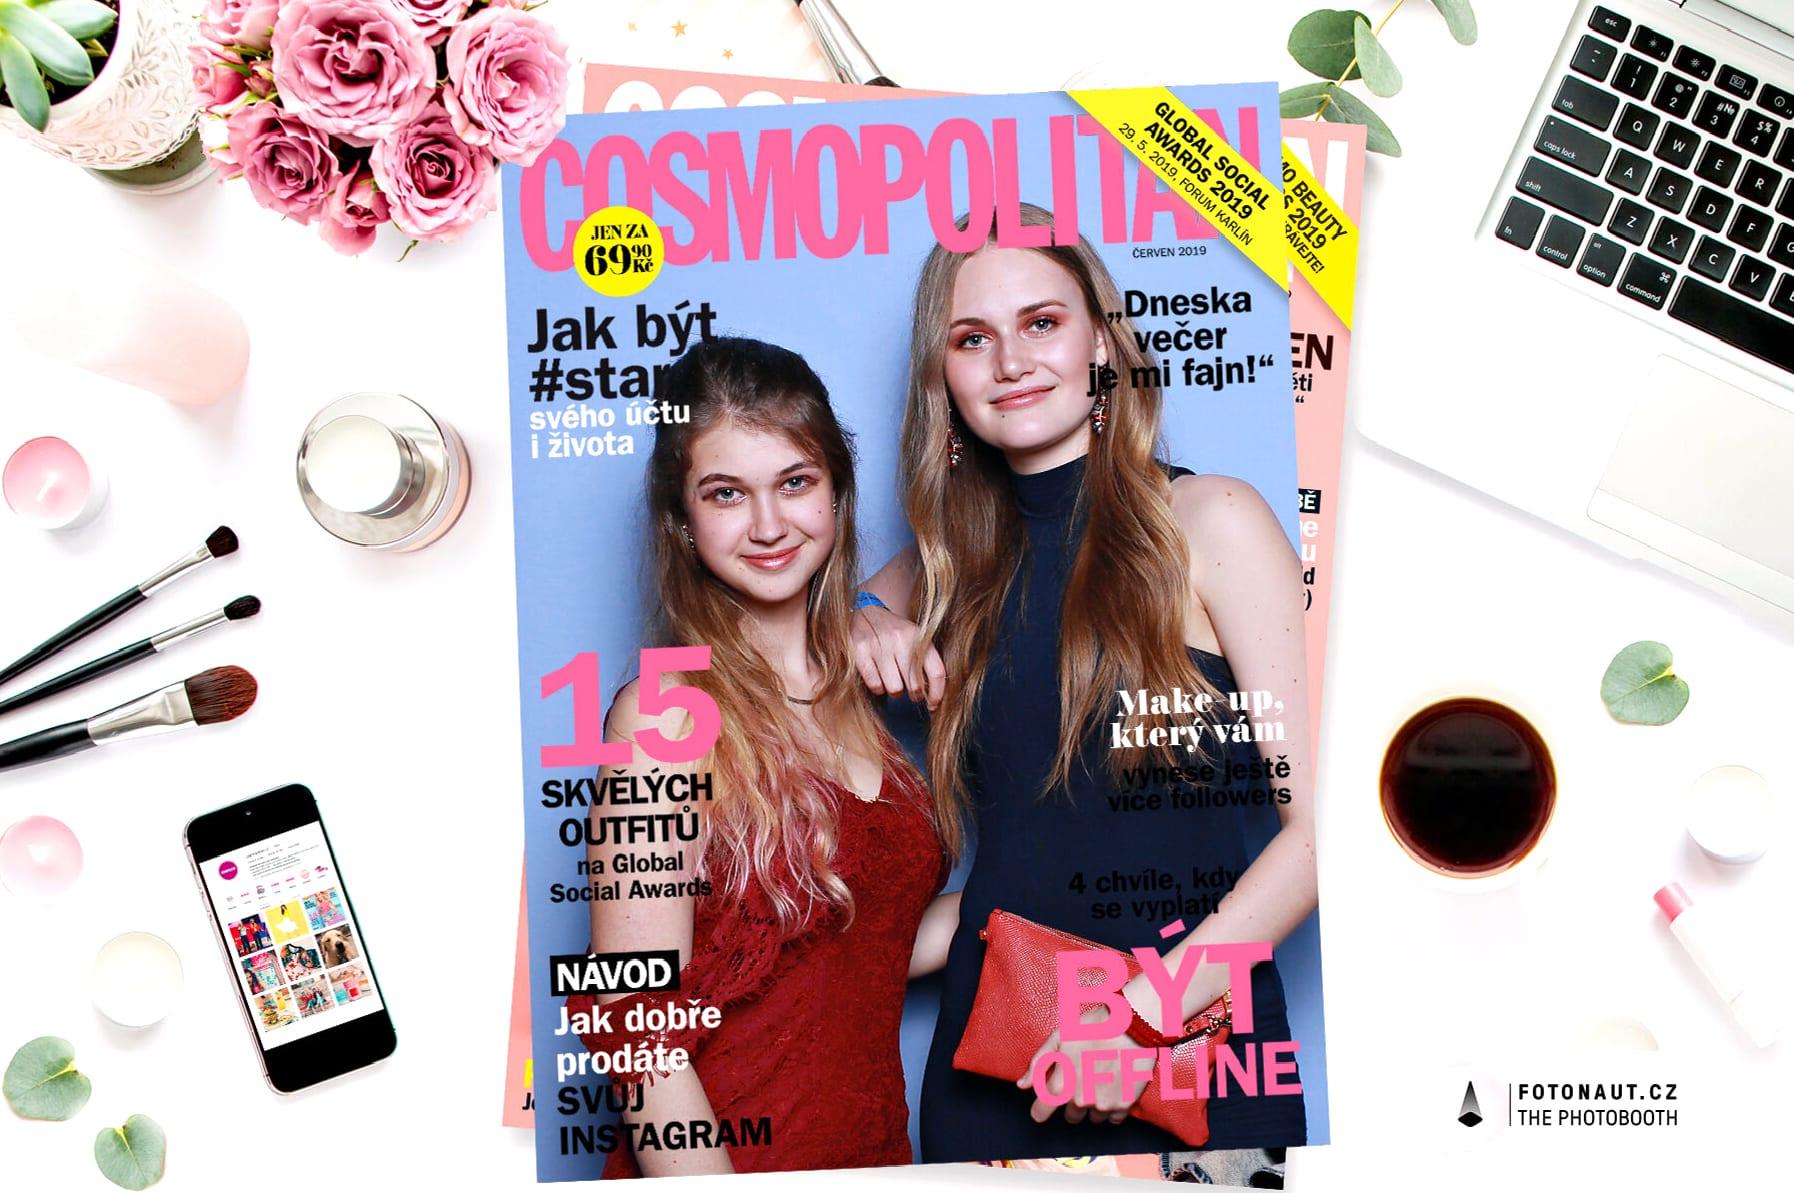 fotokoutek-cosmopolitan-29-5-2019-613855